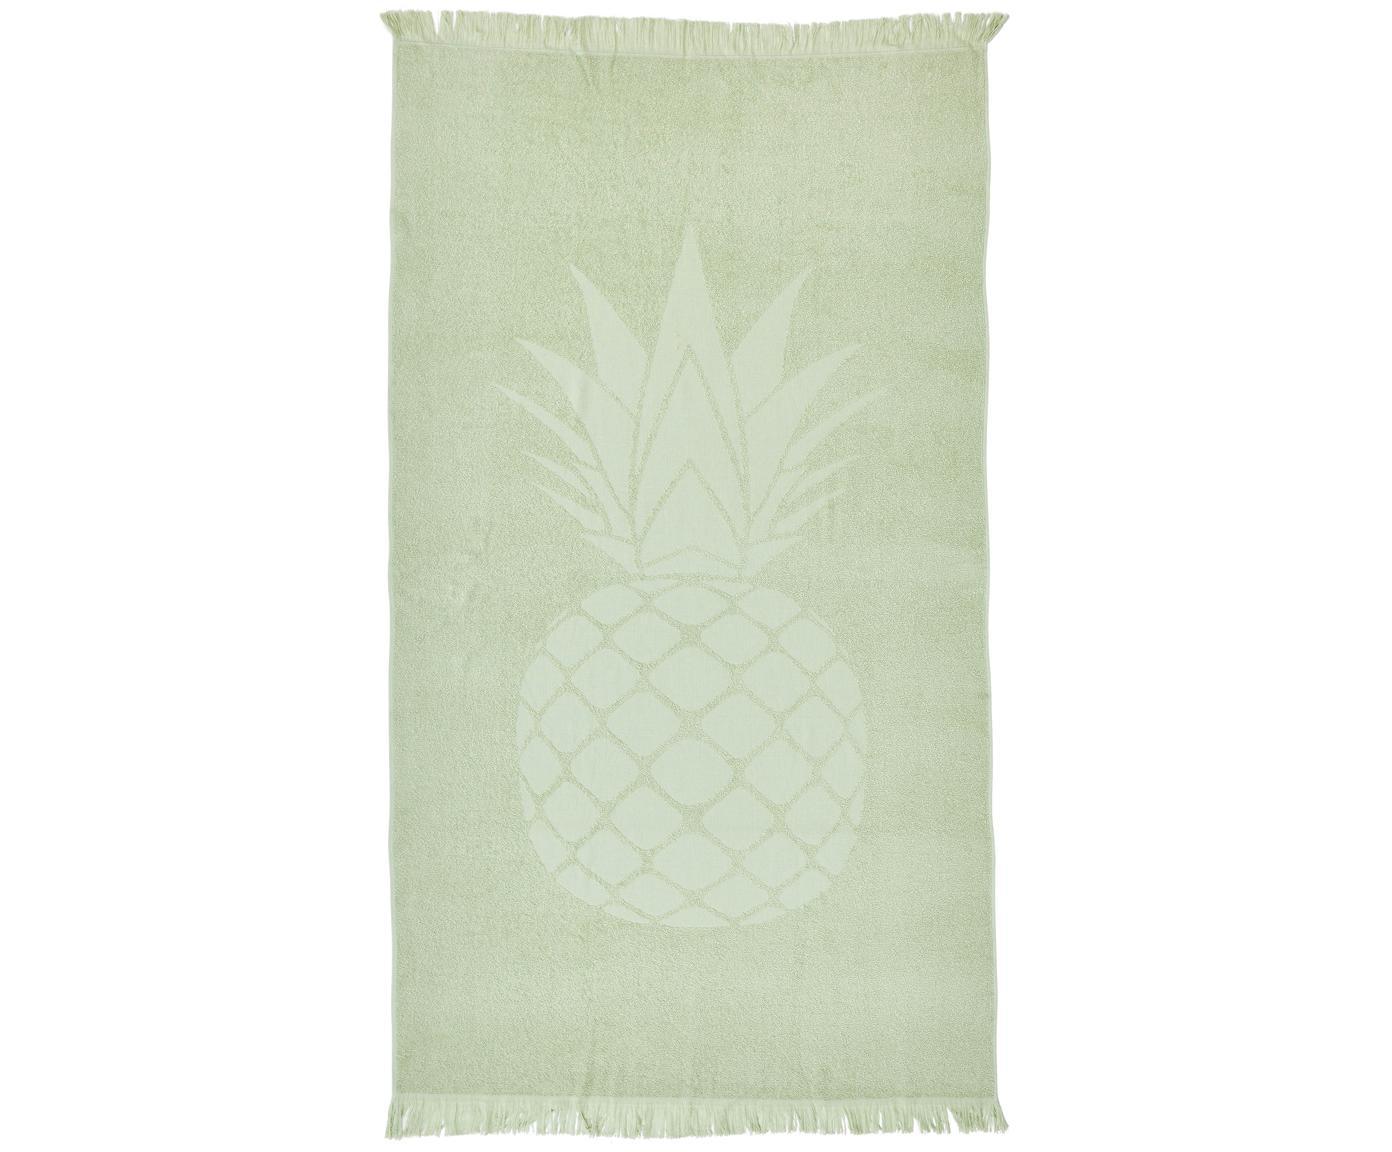 Hamamdoek Capri Pineapple, Katoen, lichte kwaliteit, 300 g/m², Lichtgroen, 90 x 160 cm